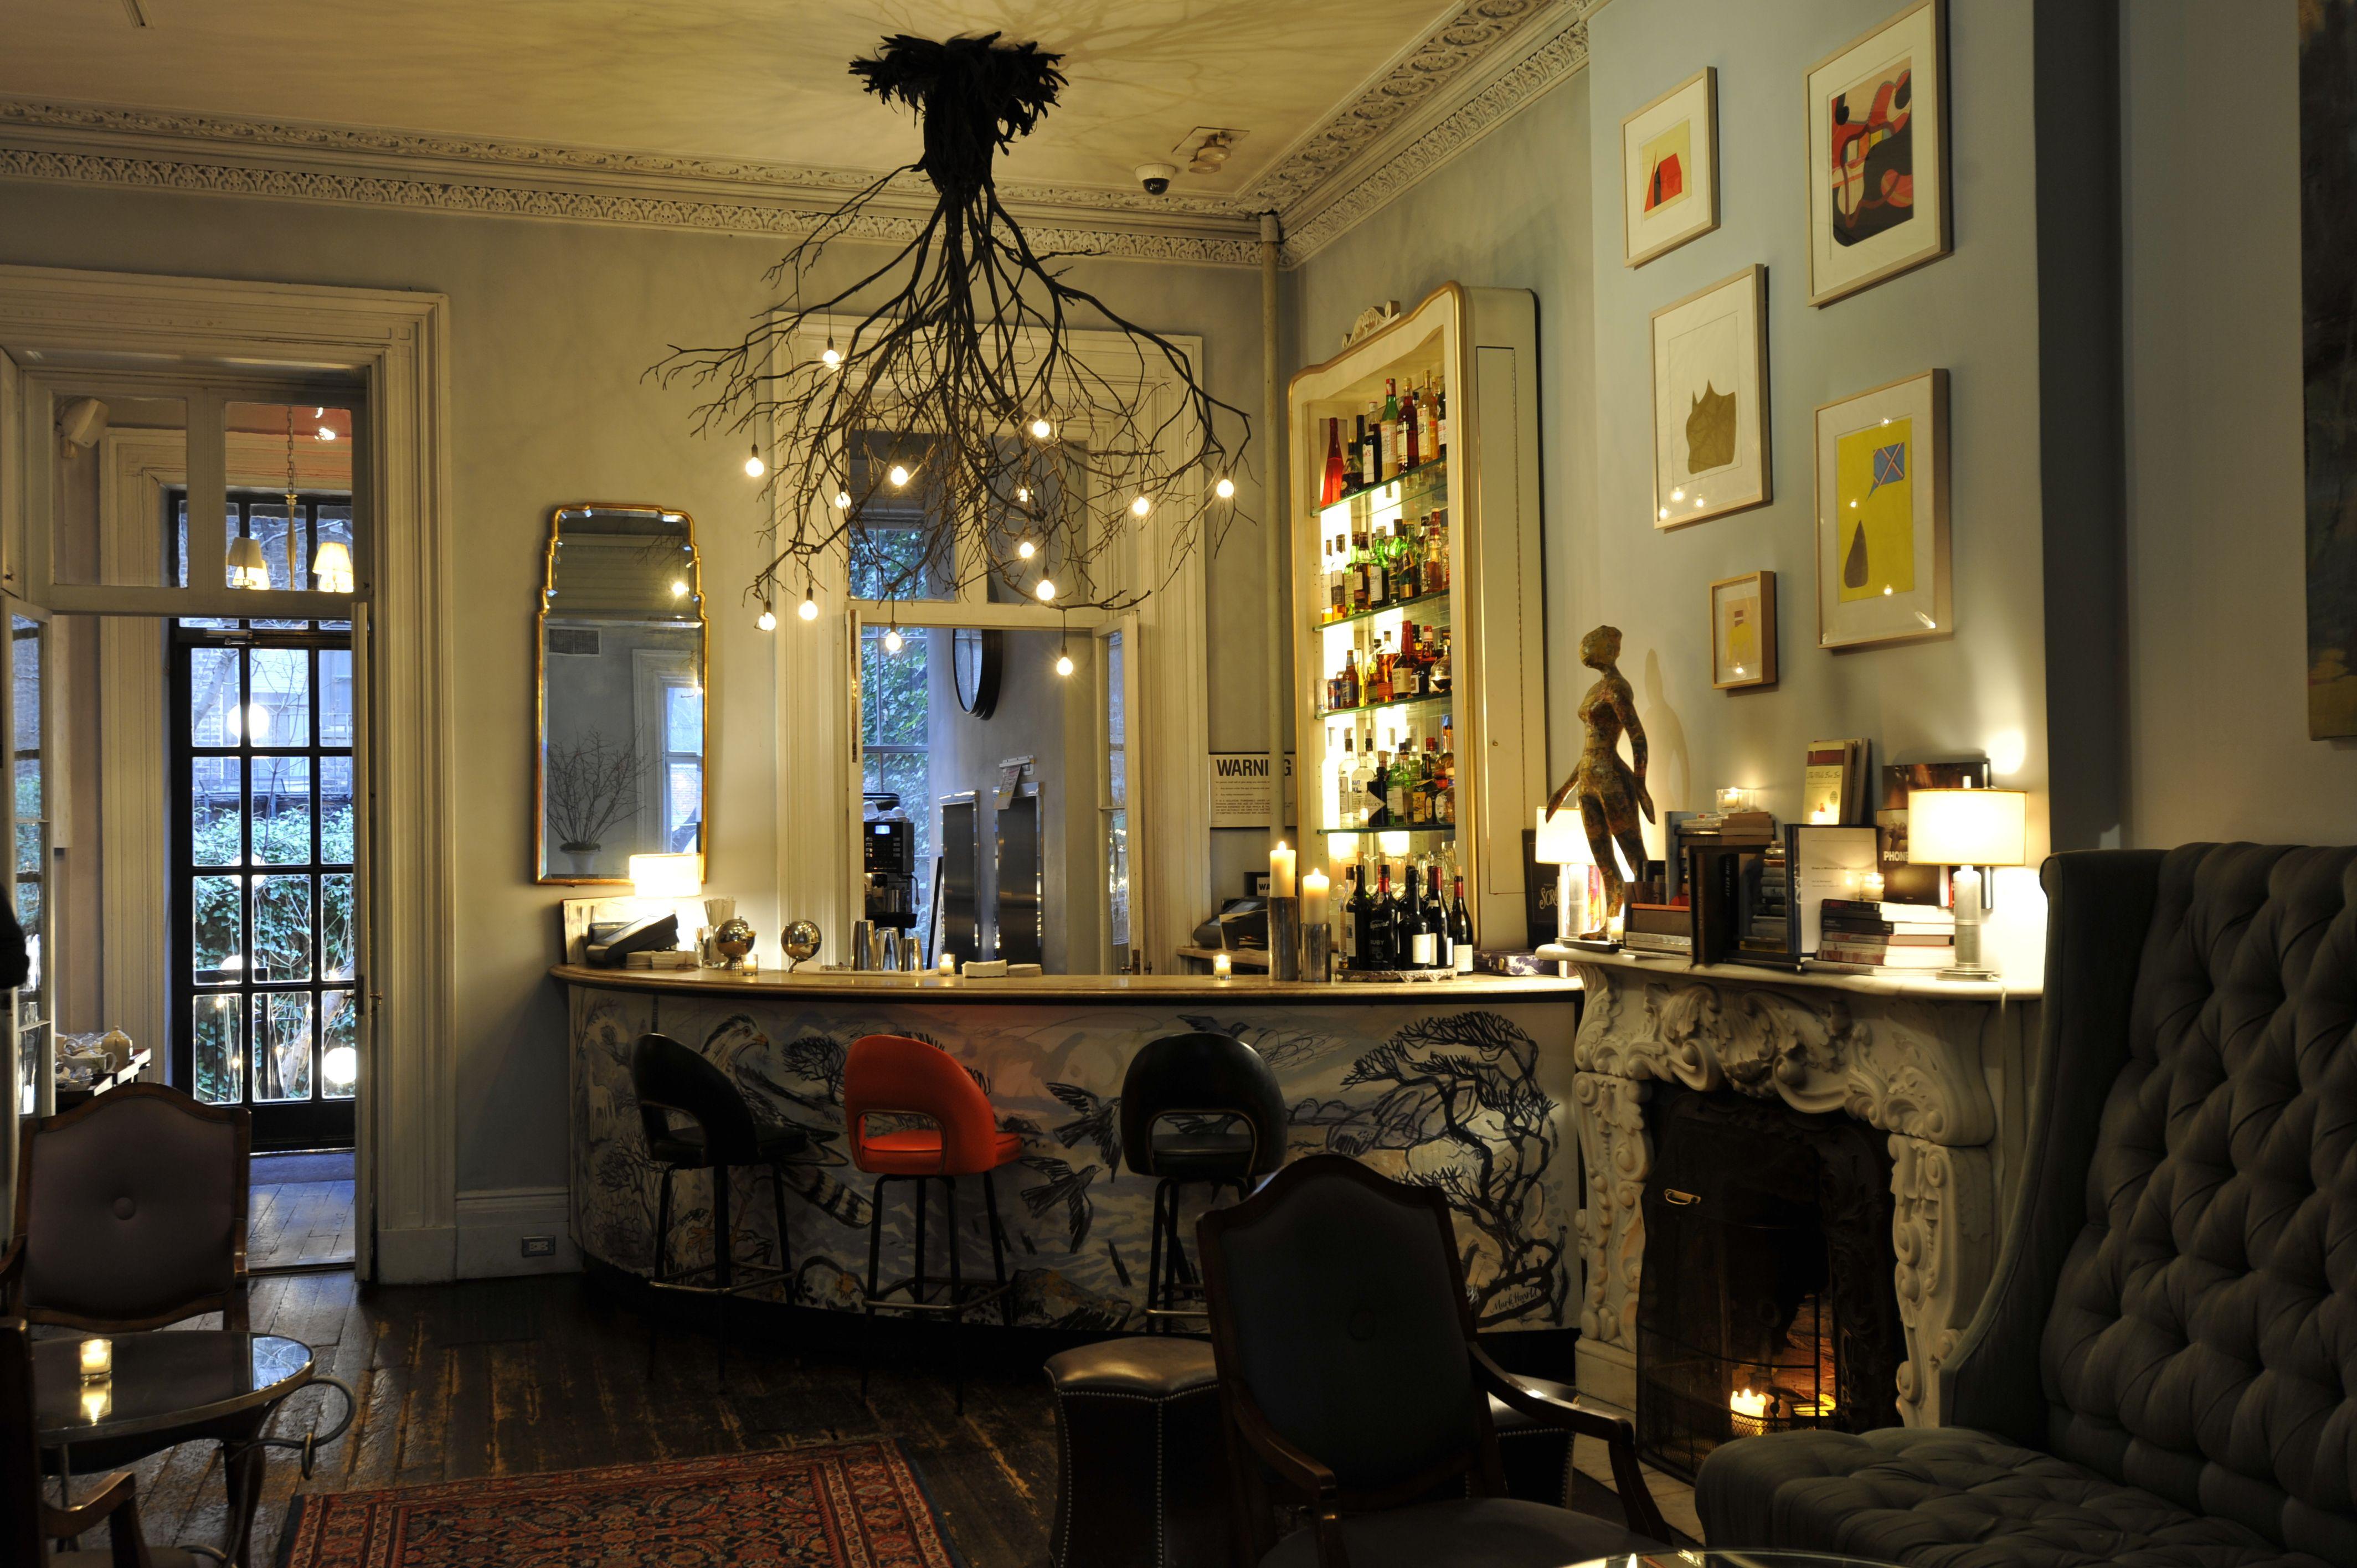 norwood house nyc - Google Search | Wedding Decor - Miscellaneous ...